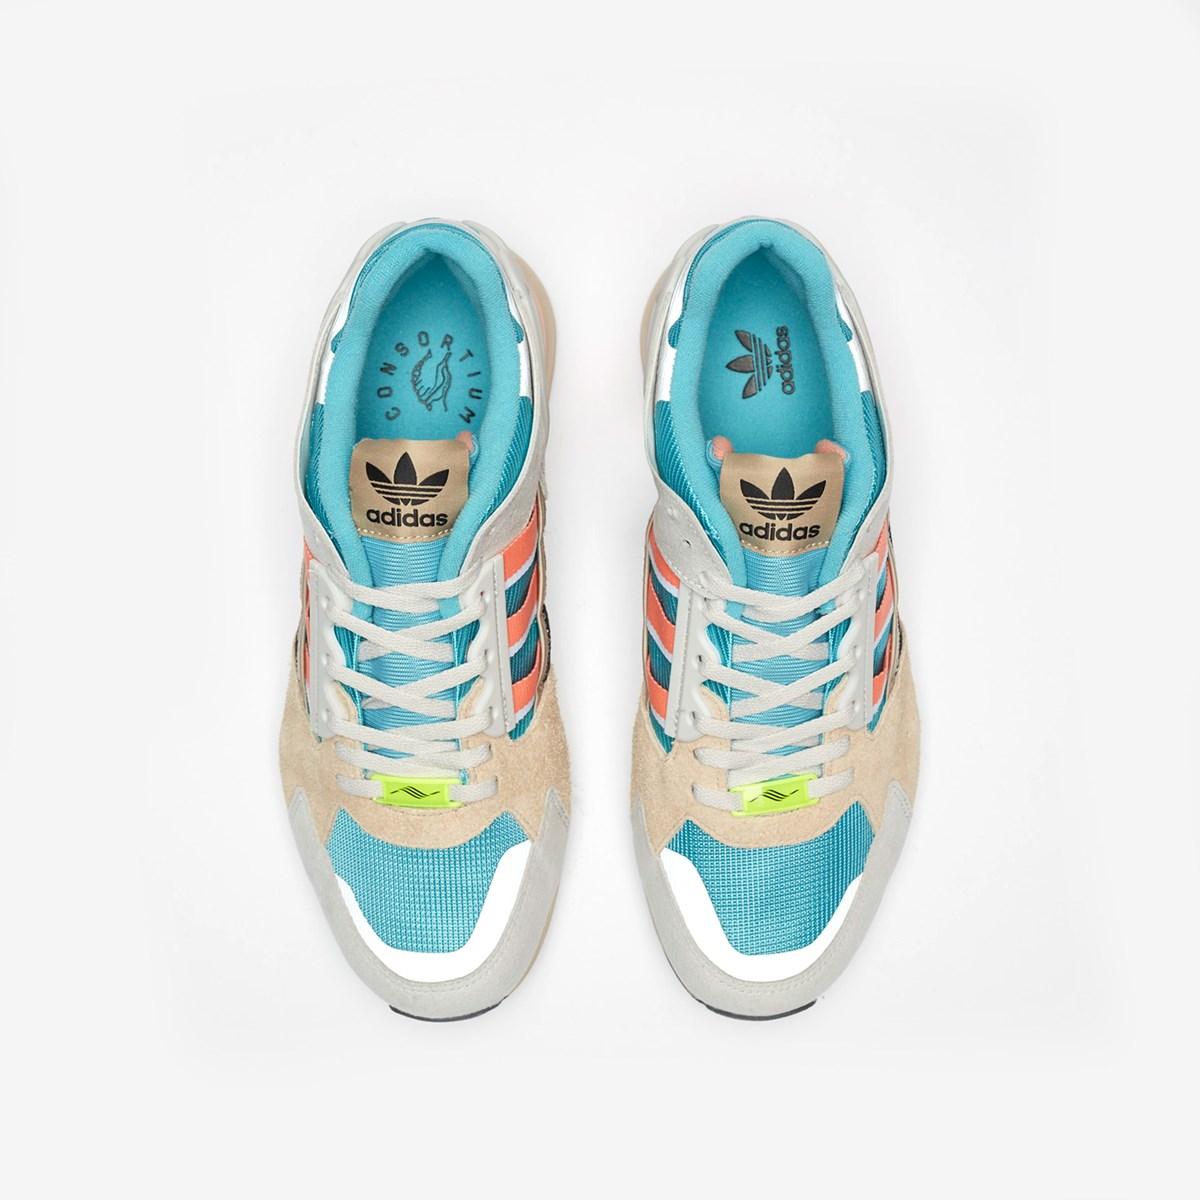 hot new products entire collection premium selection adidas ZX 10.000 C - Ee9485 - Sneakersnstuff | sneakers & streetwear en  ligne depuis 1999